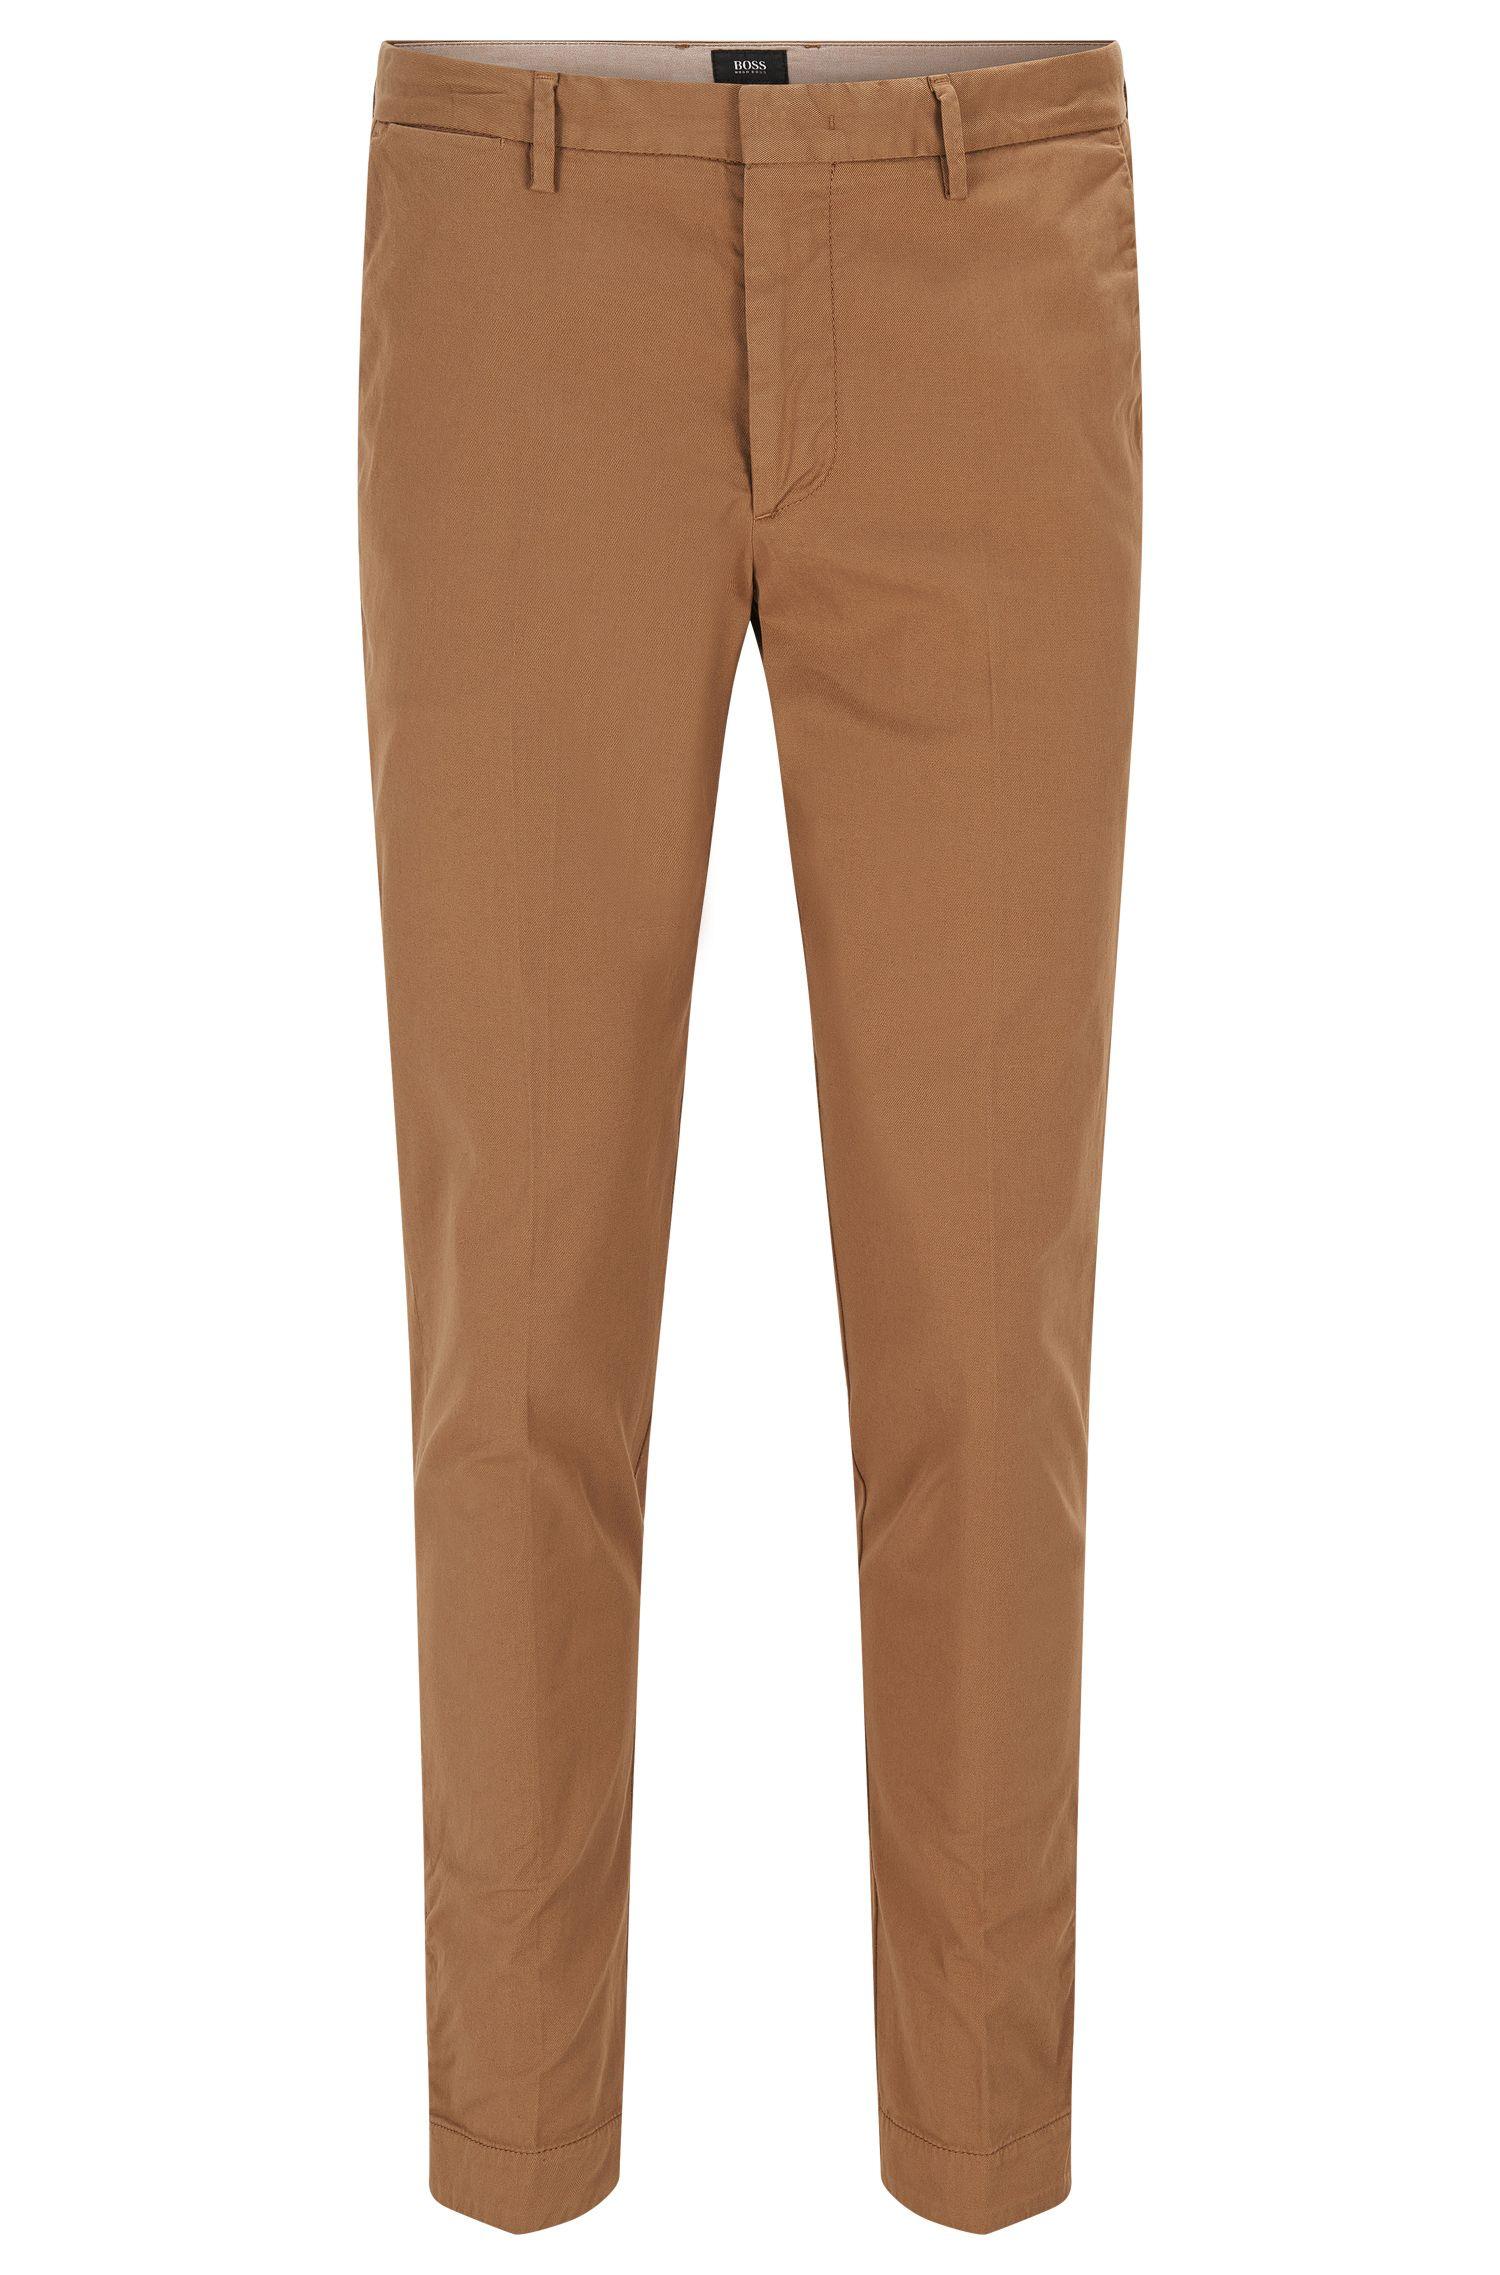 'Kaito Pat D'   Slim Fit, Gabardine Stretch Cotton Chino Pants